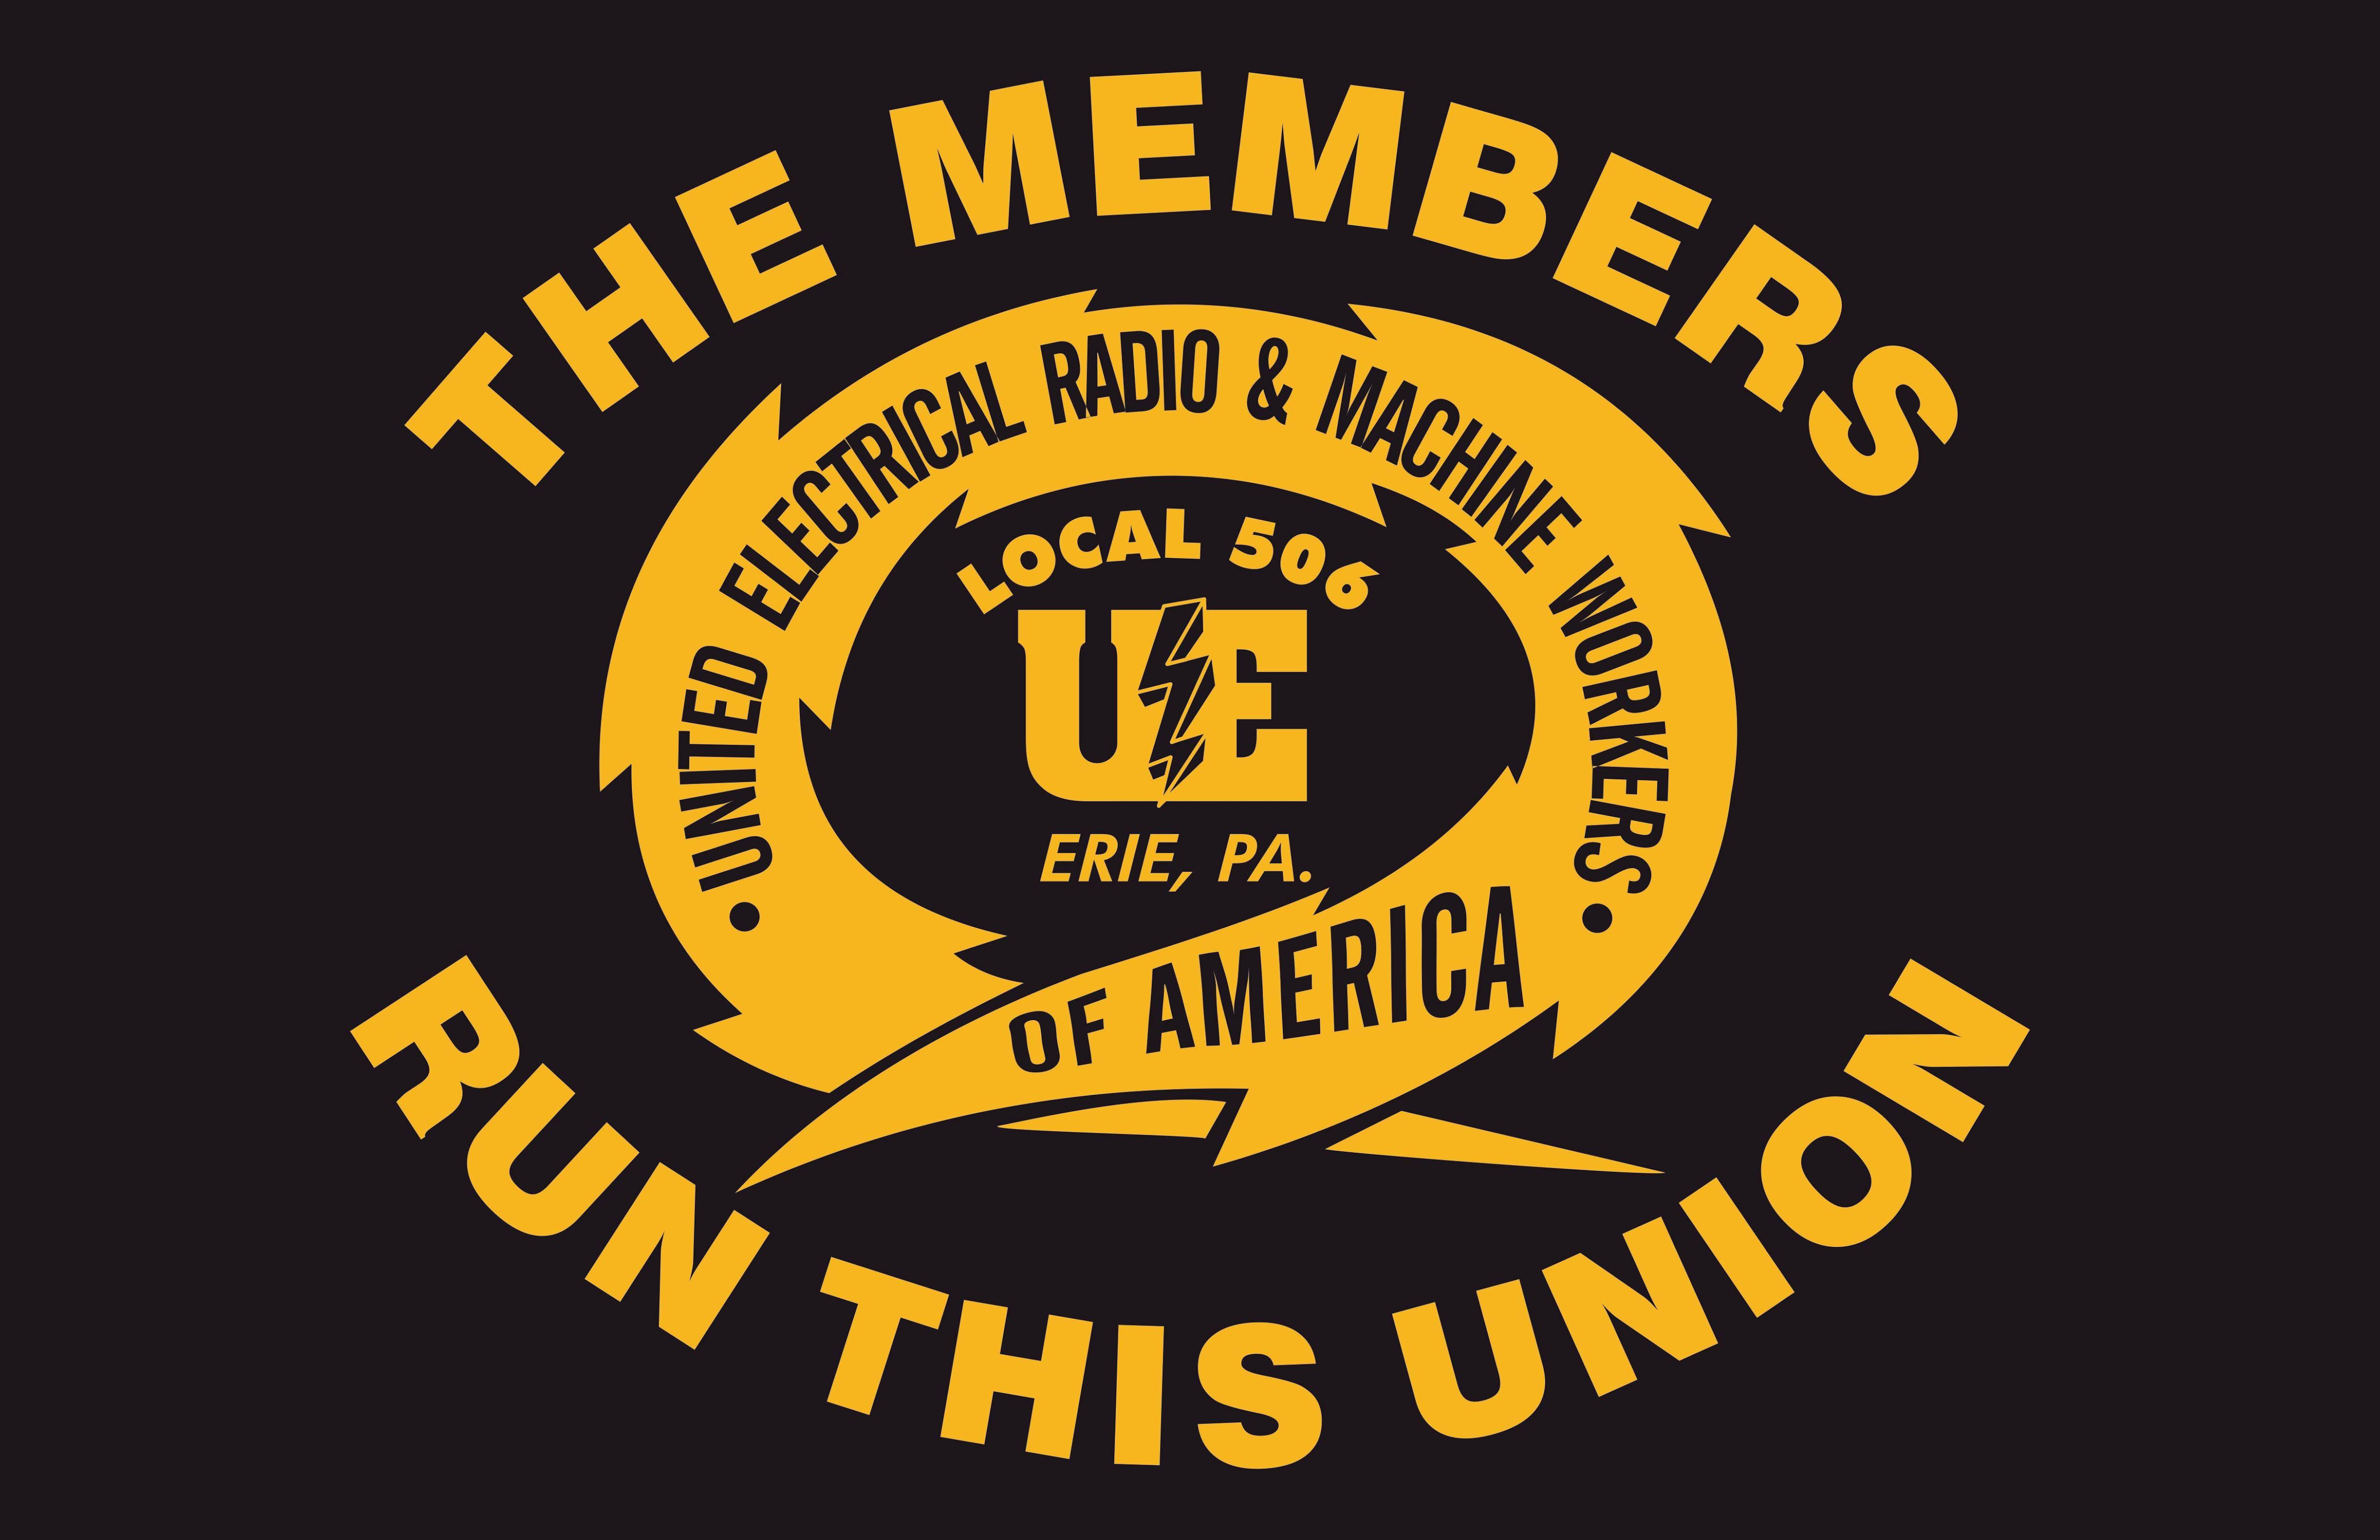 UE-506-Members-Run-This-Union-1